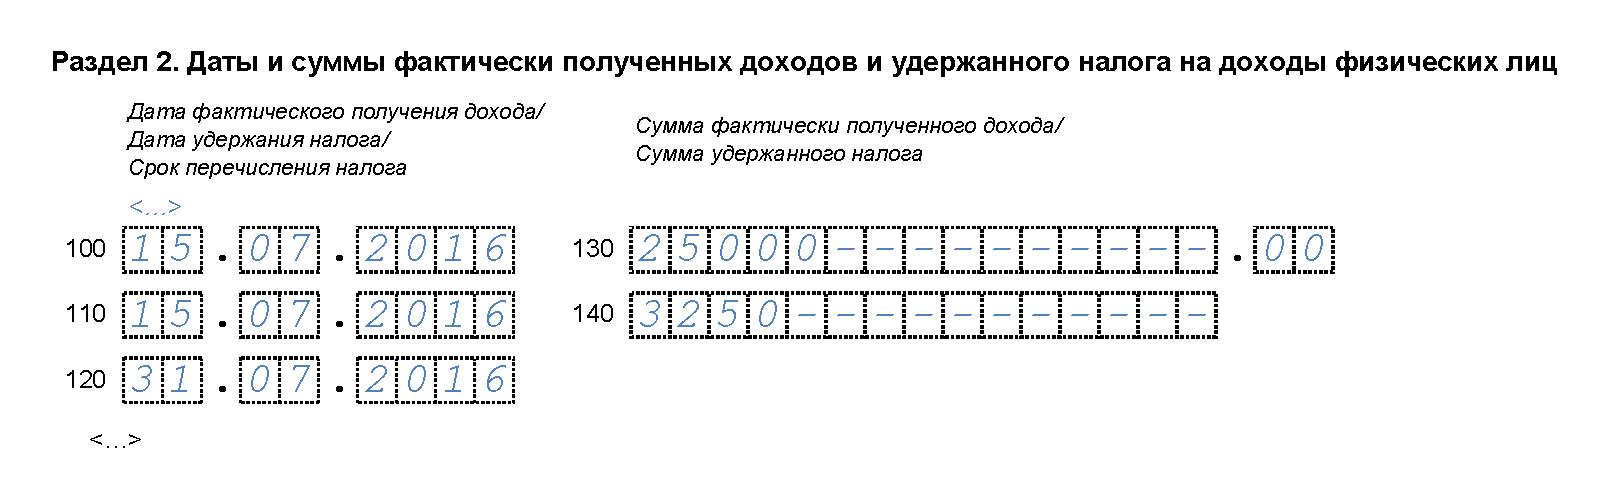 6-НДФЛ за 3 квартал 2016 года